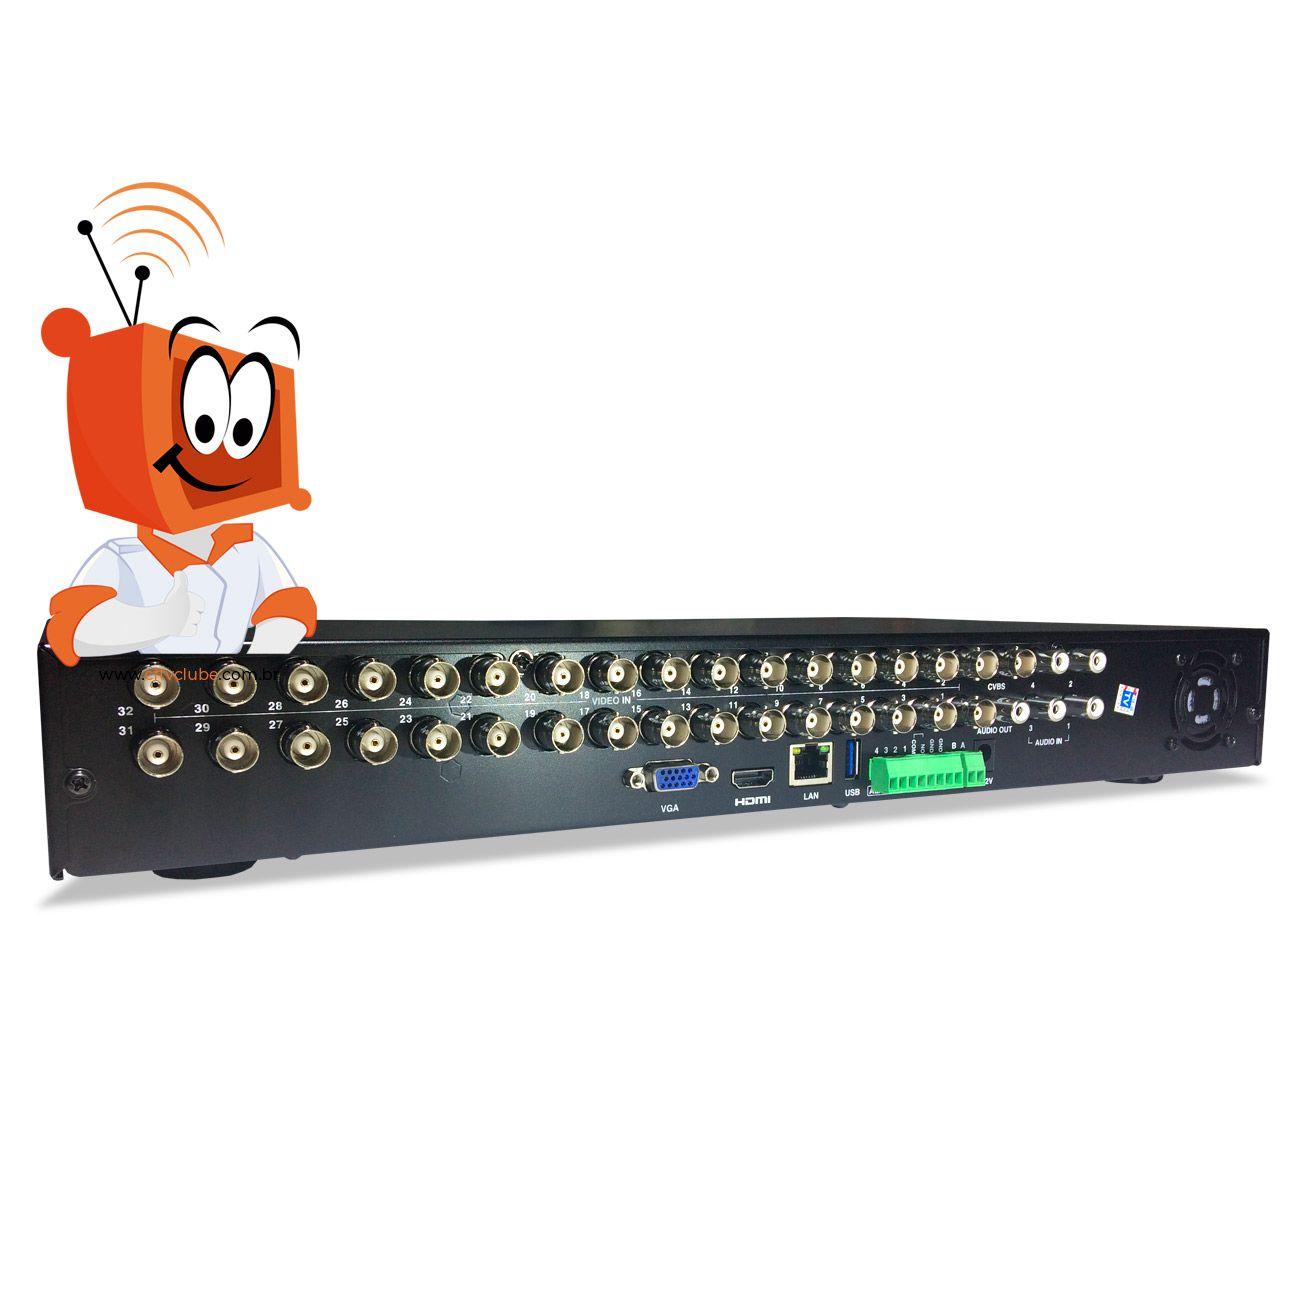 DVR Stand Alone Digital Tecvoz 32 Canais Flex Full HD + 4 canais IP 4 megapixels TW-P3032  - CFTV Clube | Brasil